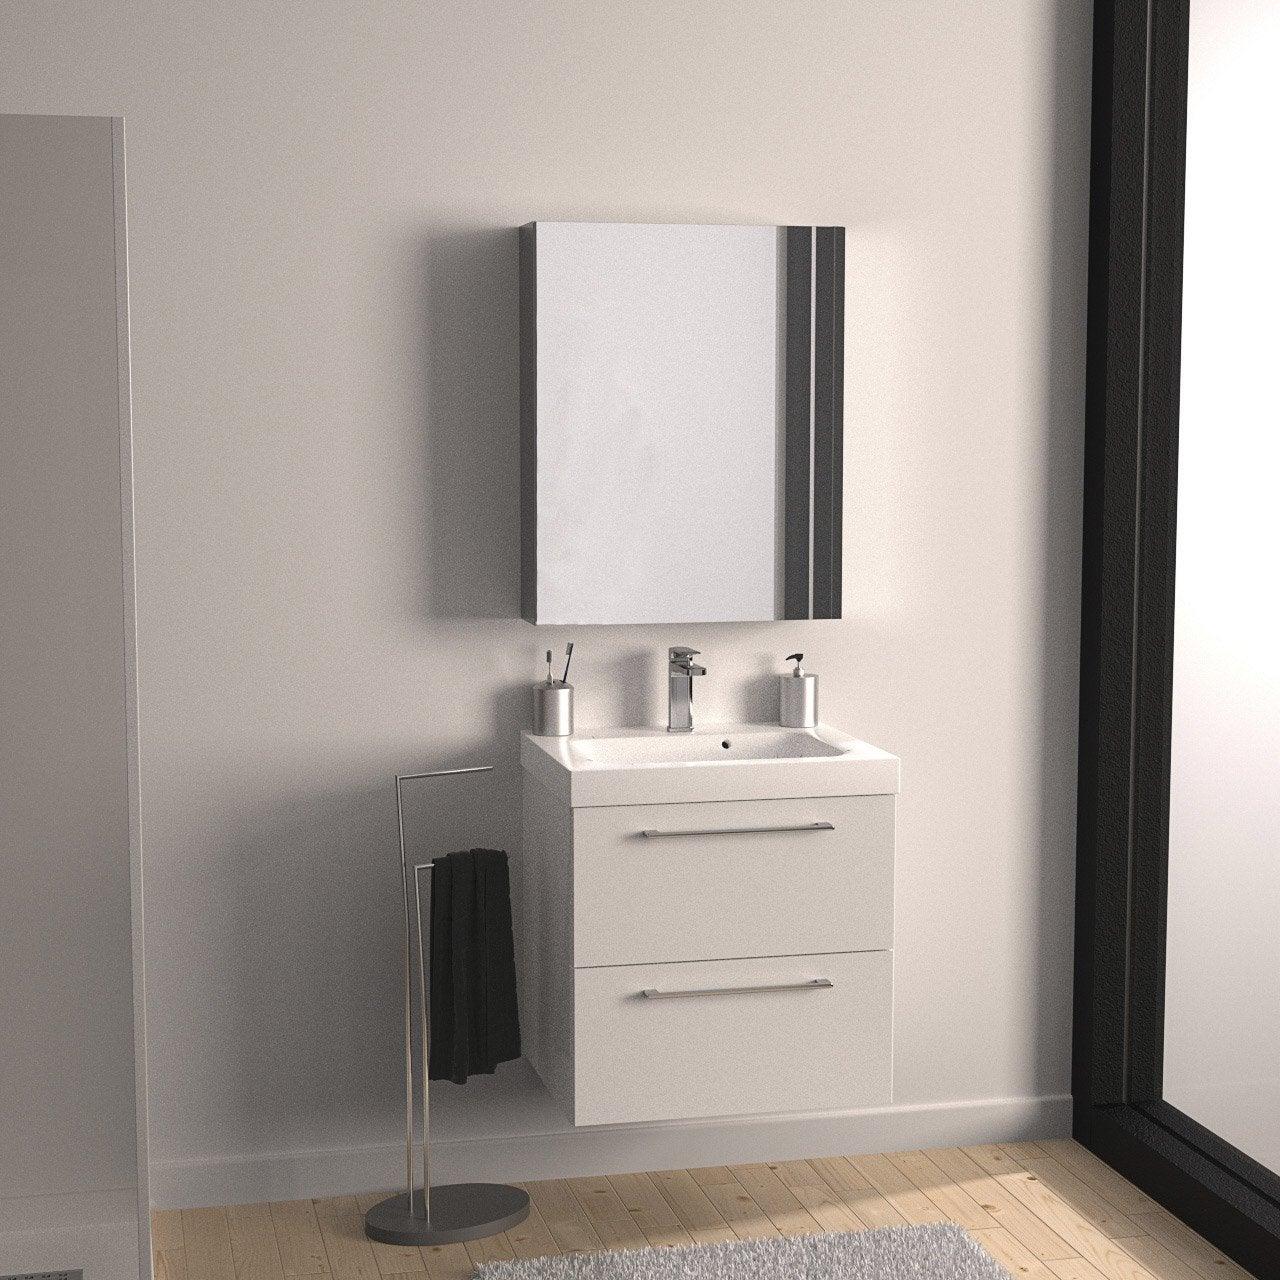 Meuble de salle de bains remix blanc blanc n 0 61x48 5 cm for Meuble salle de bain aubergine leroy merlin